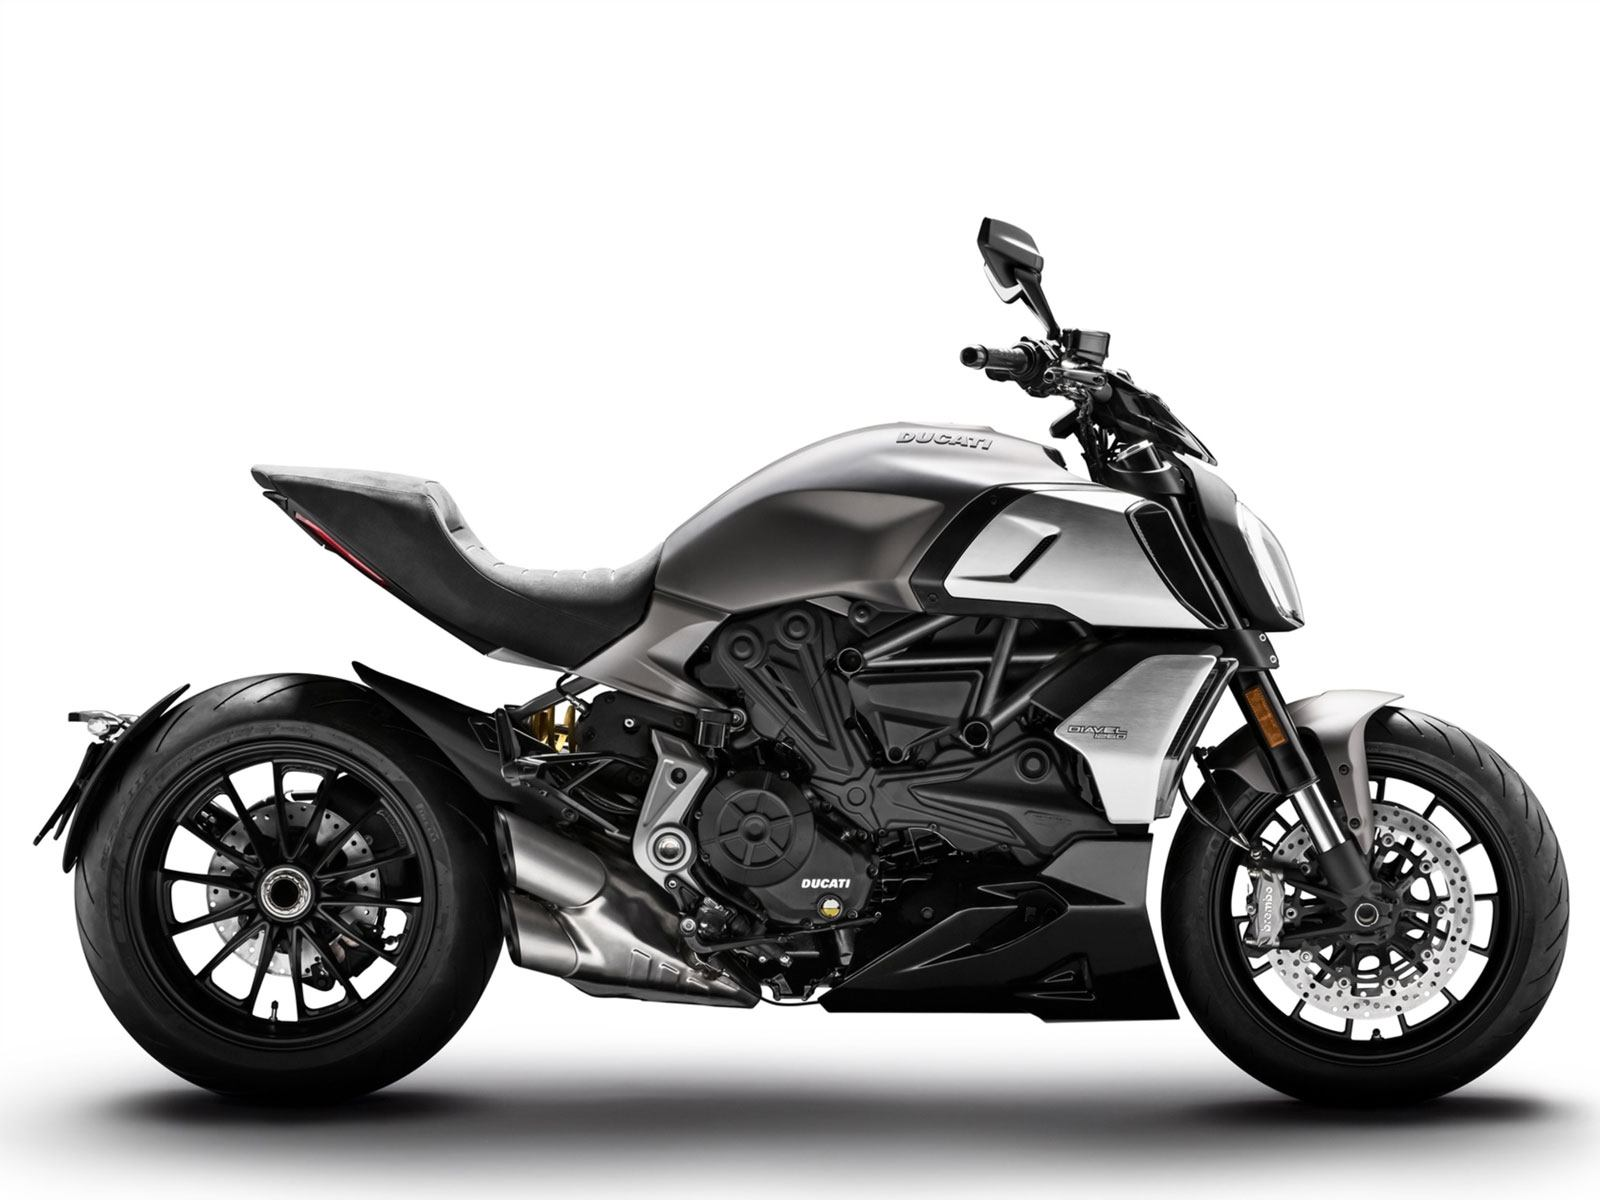 Мотоцикл DUCATI Diavel 1260 - Sandstone Grey (2019)